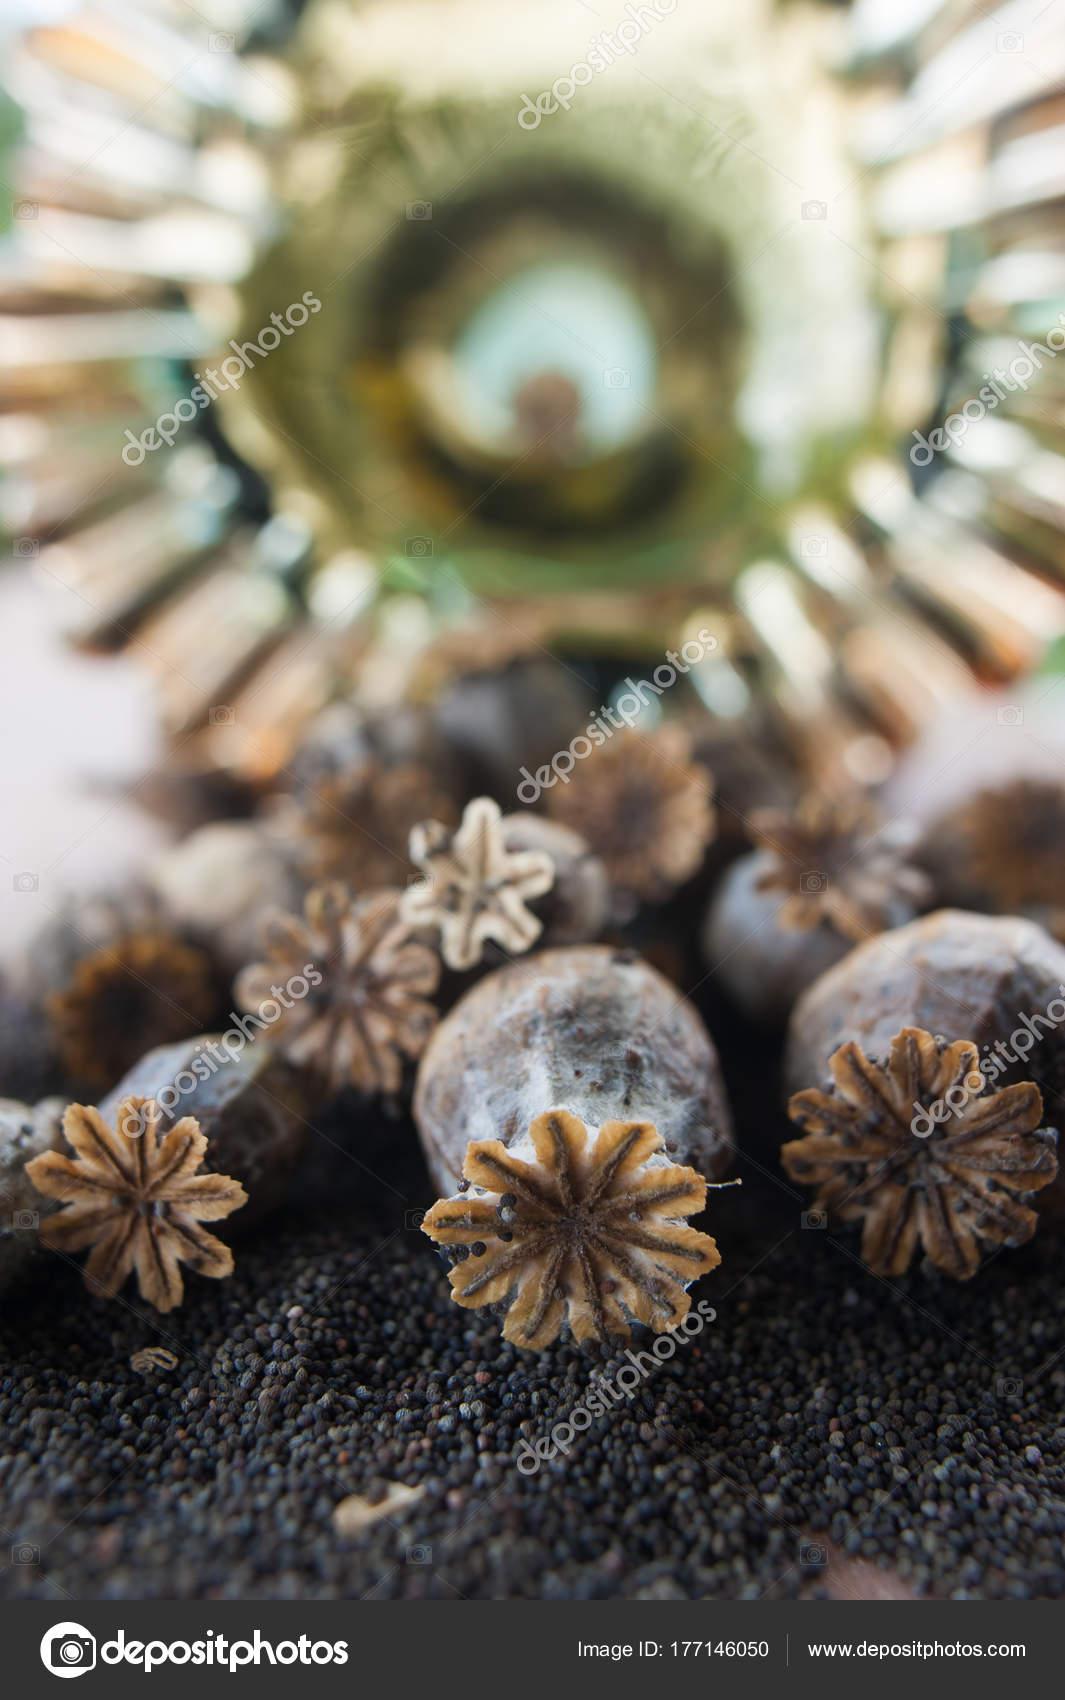 Dry Poppy Capsules And Black Seeds Macro Stock Photo